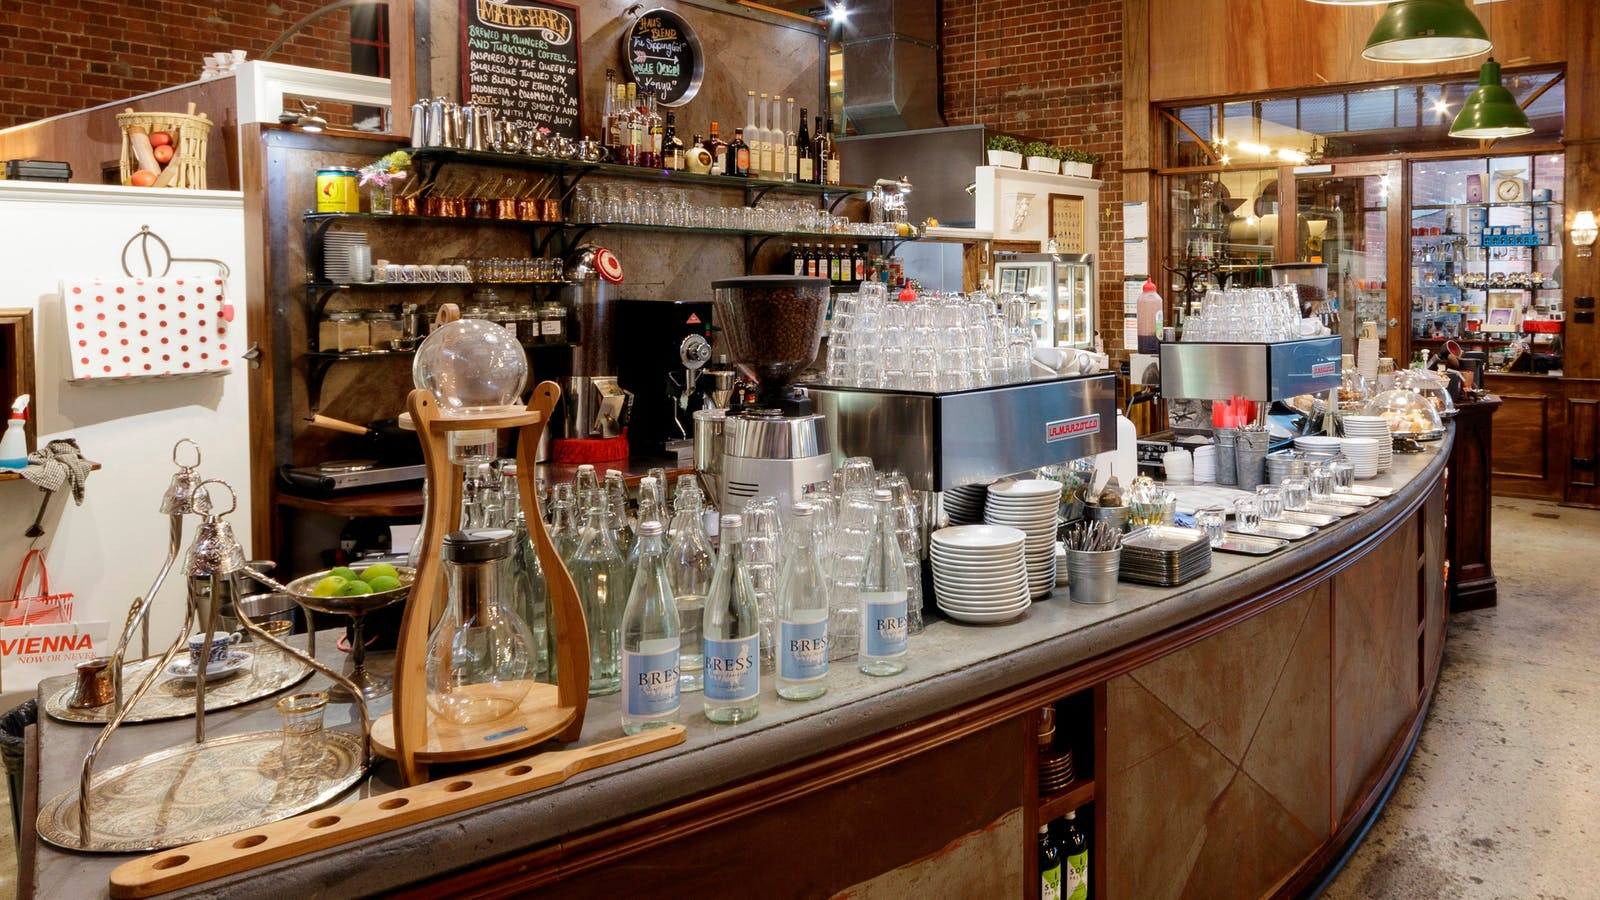 Das Kaffeehaus coffee roastery and Austrian coffee house